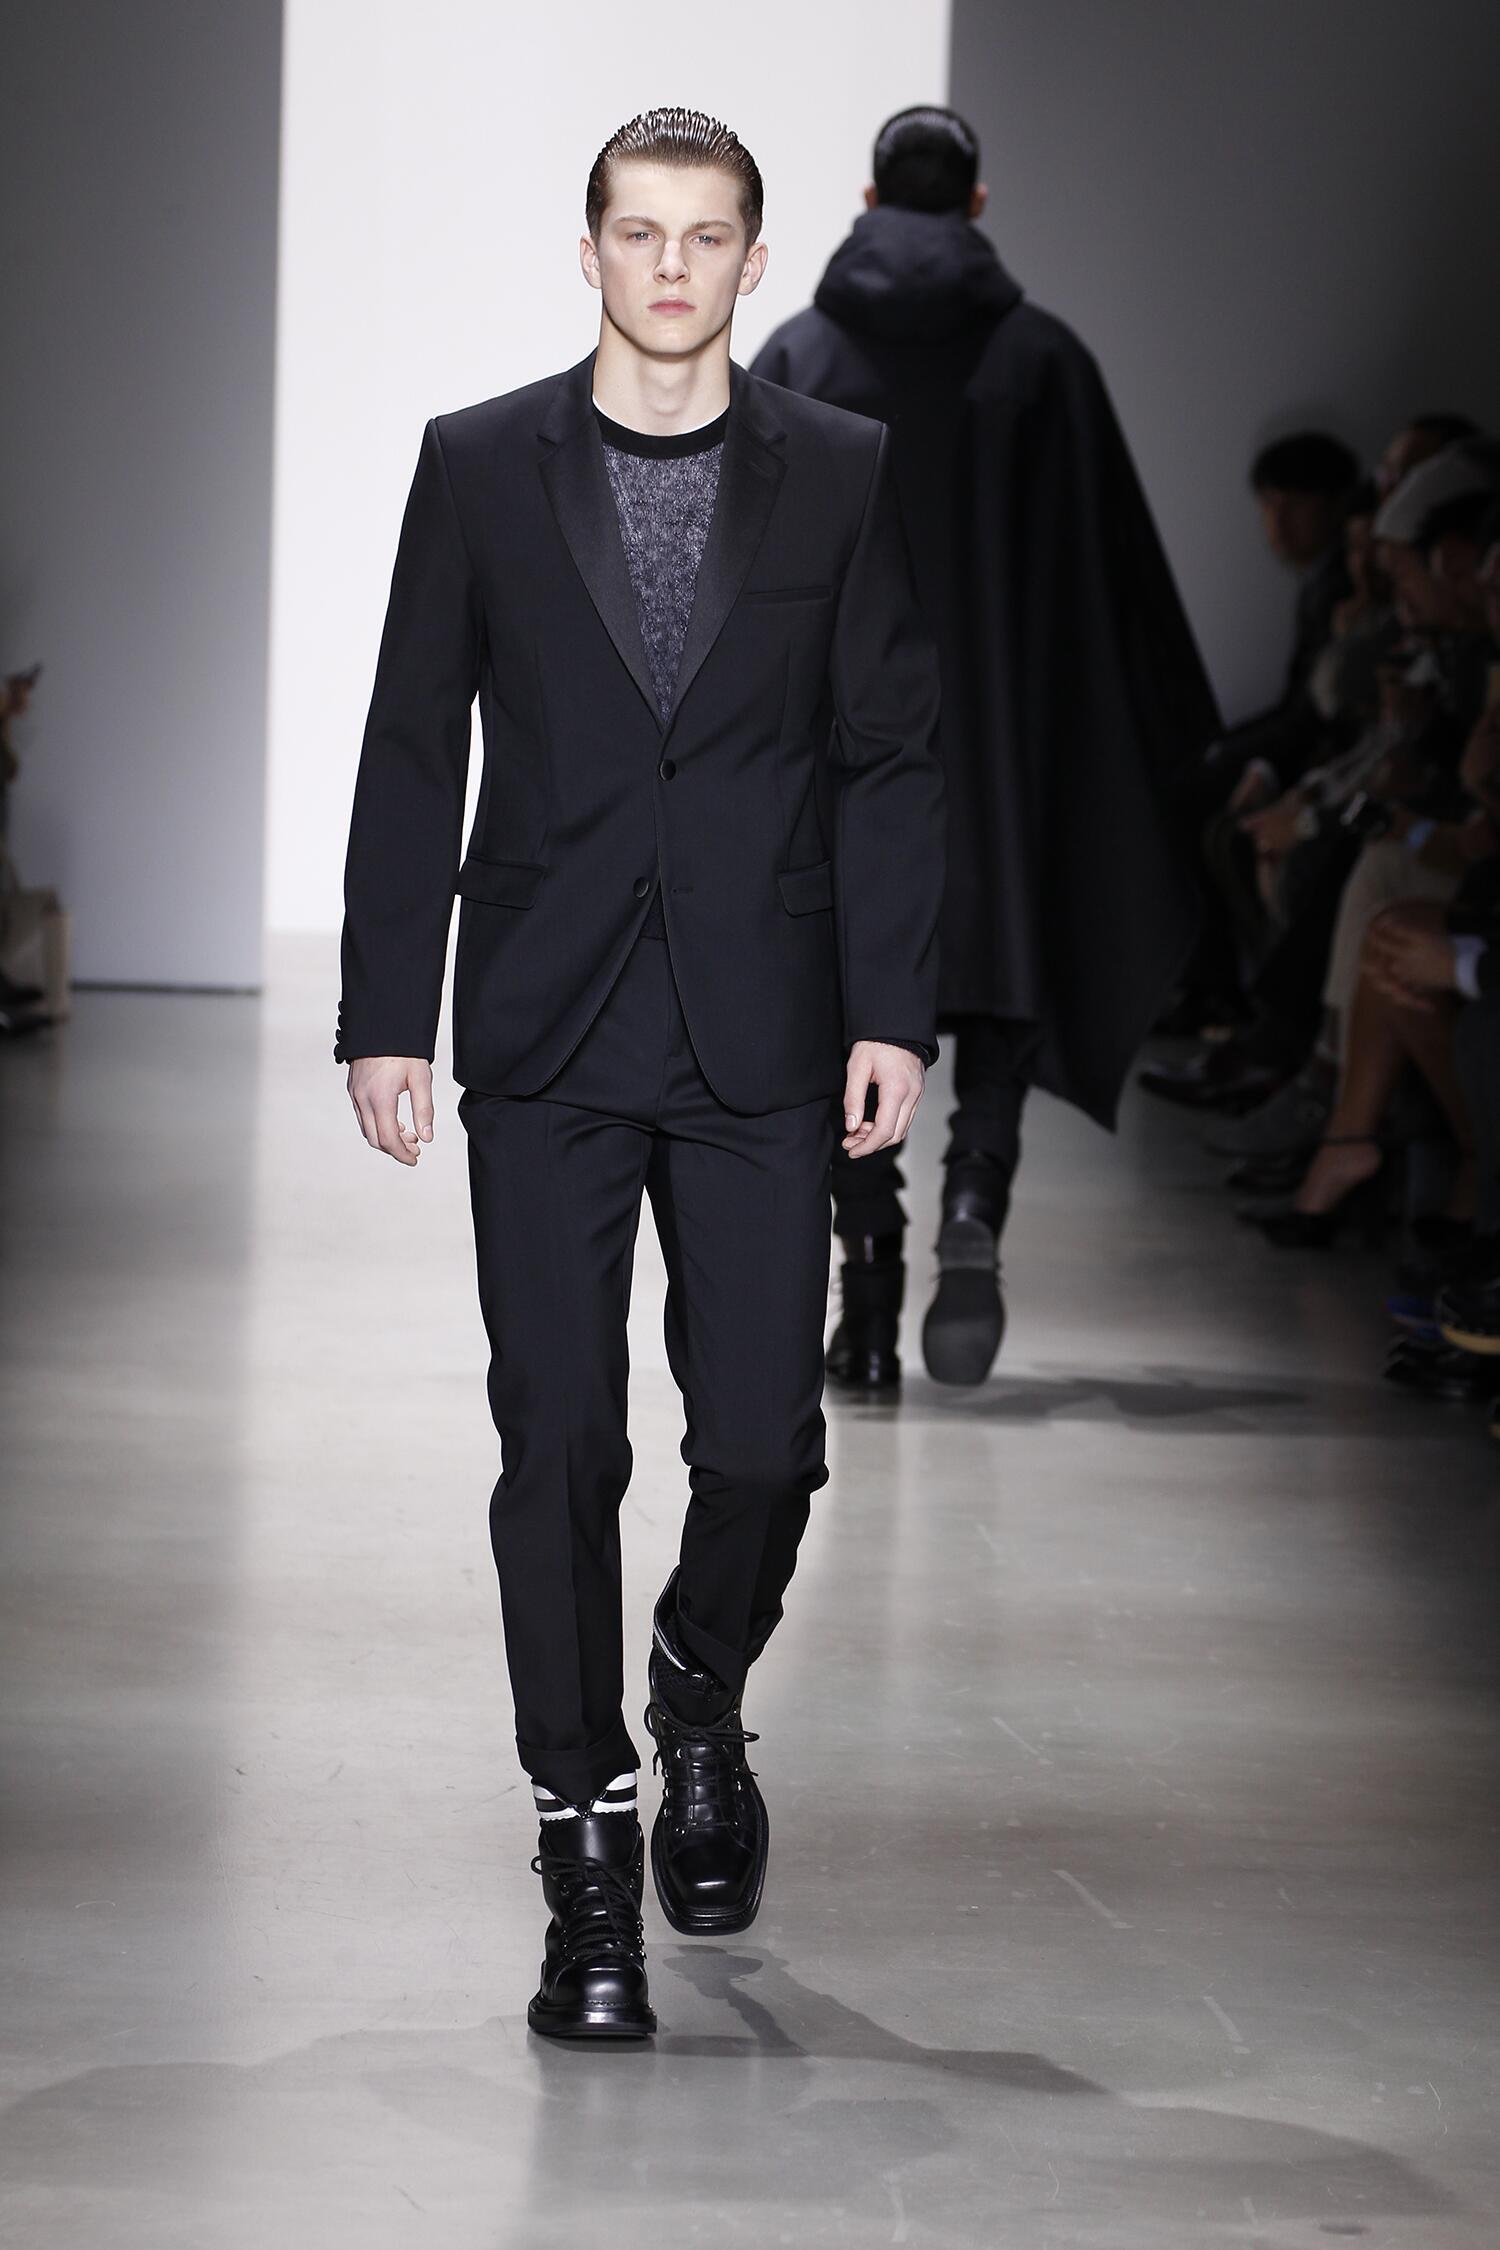 Runway Calvin Klein Fall Winter 2015 16 Men's Collection Milano Fashion Week